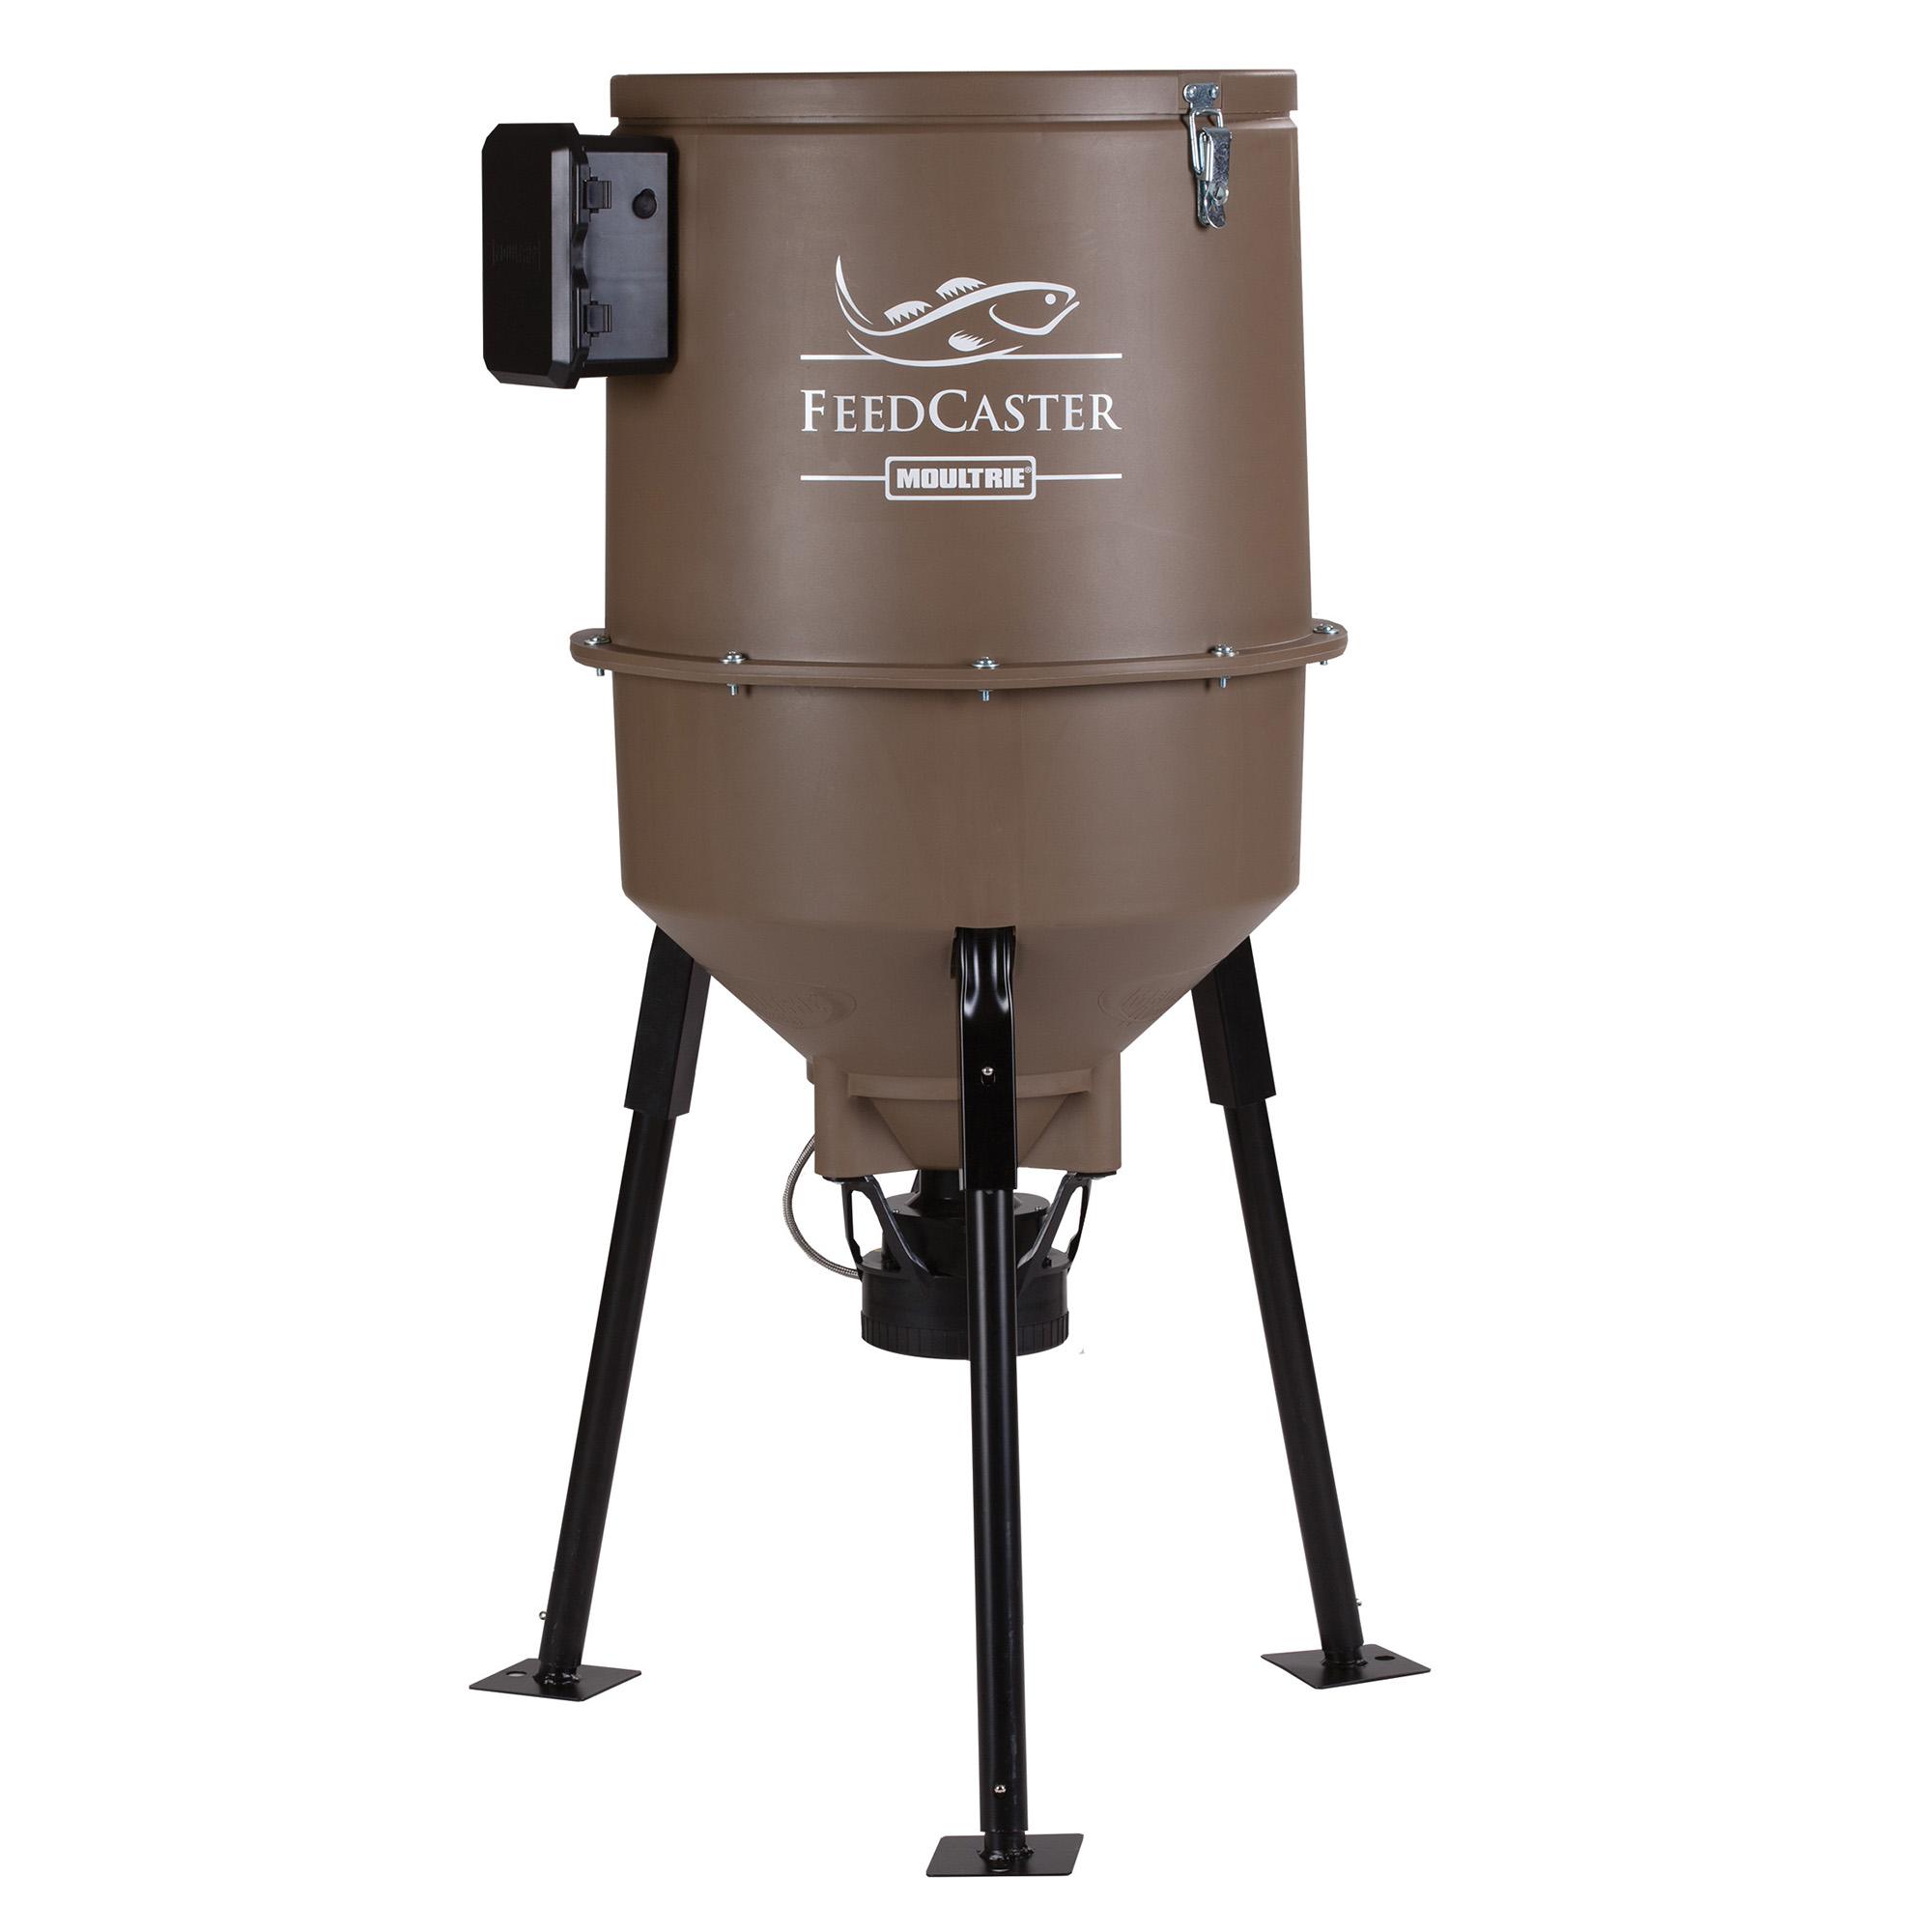 Moultrie 30 Gallon Feedcaster Pro Directional Tripod Fish Feeder w/ Metal Feet